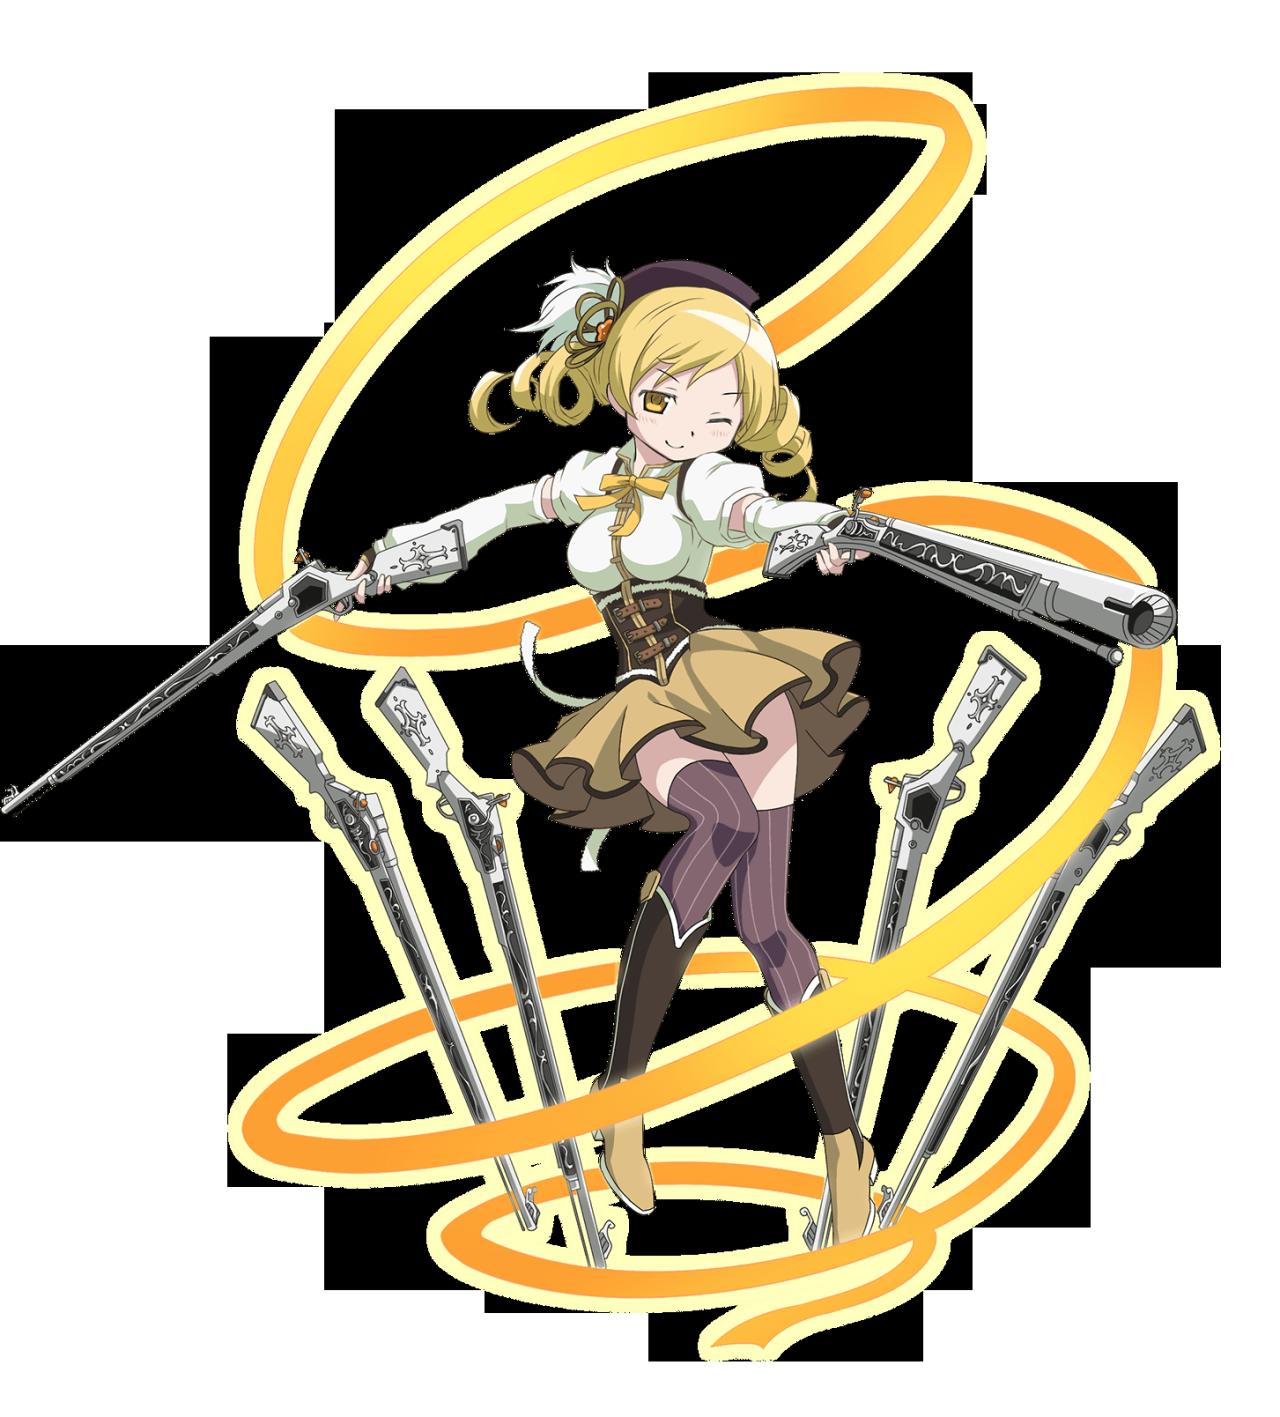 Clipart woman archery. Mami tomoe vs battles